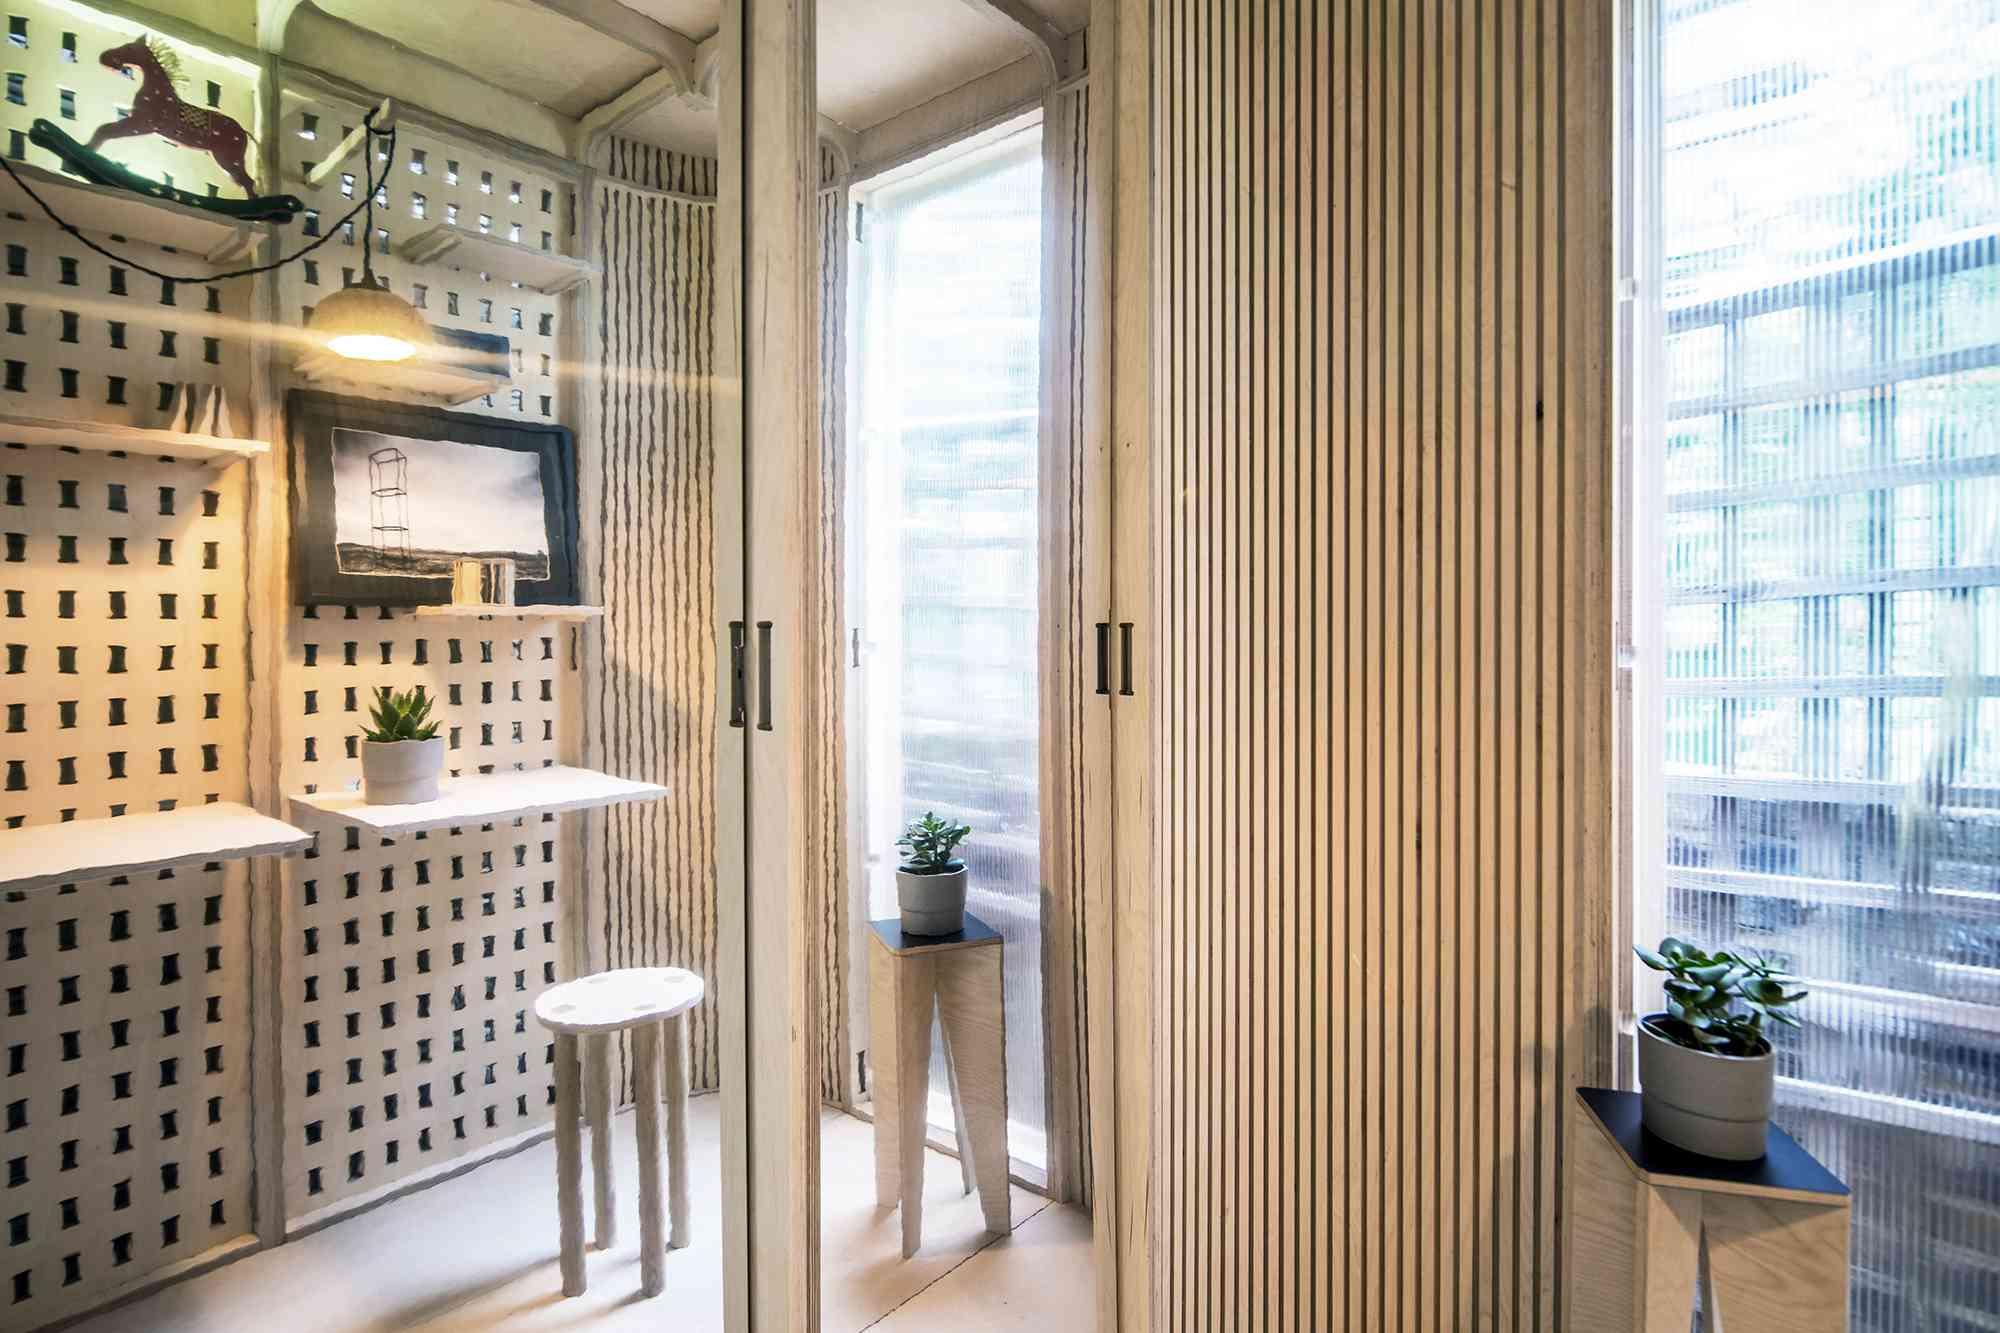 My Room In The Garden prefab home office module Boano Prišmontas mirrored panels